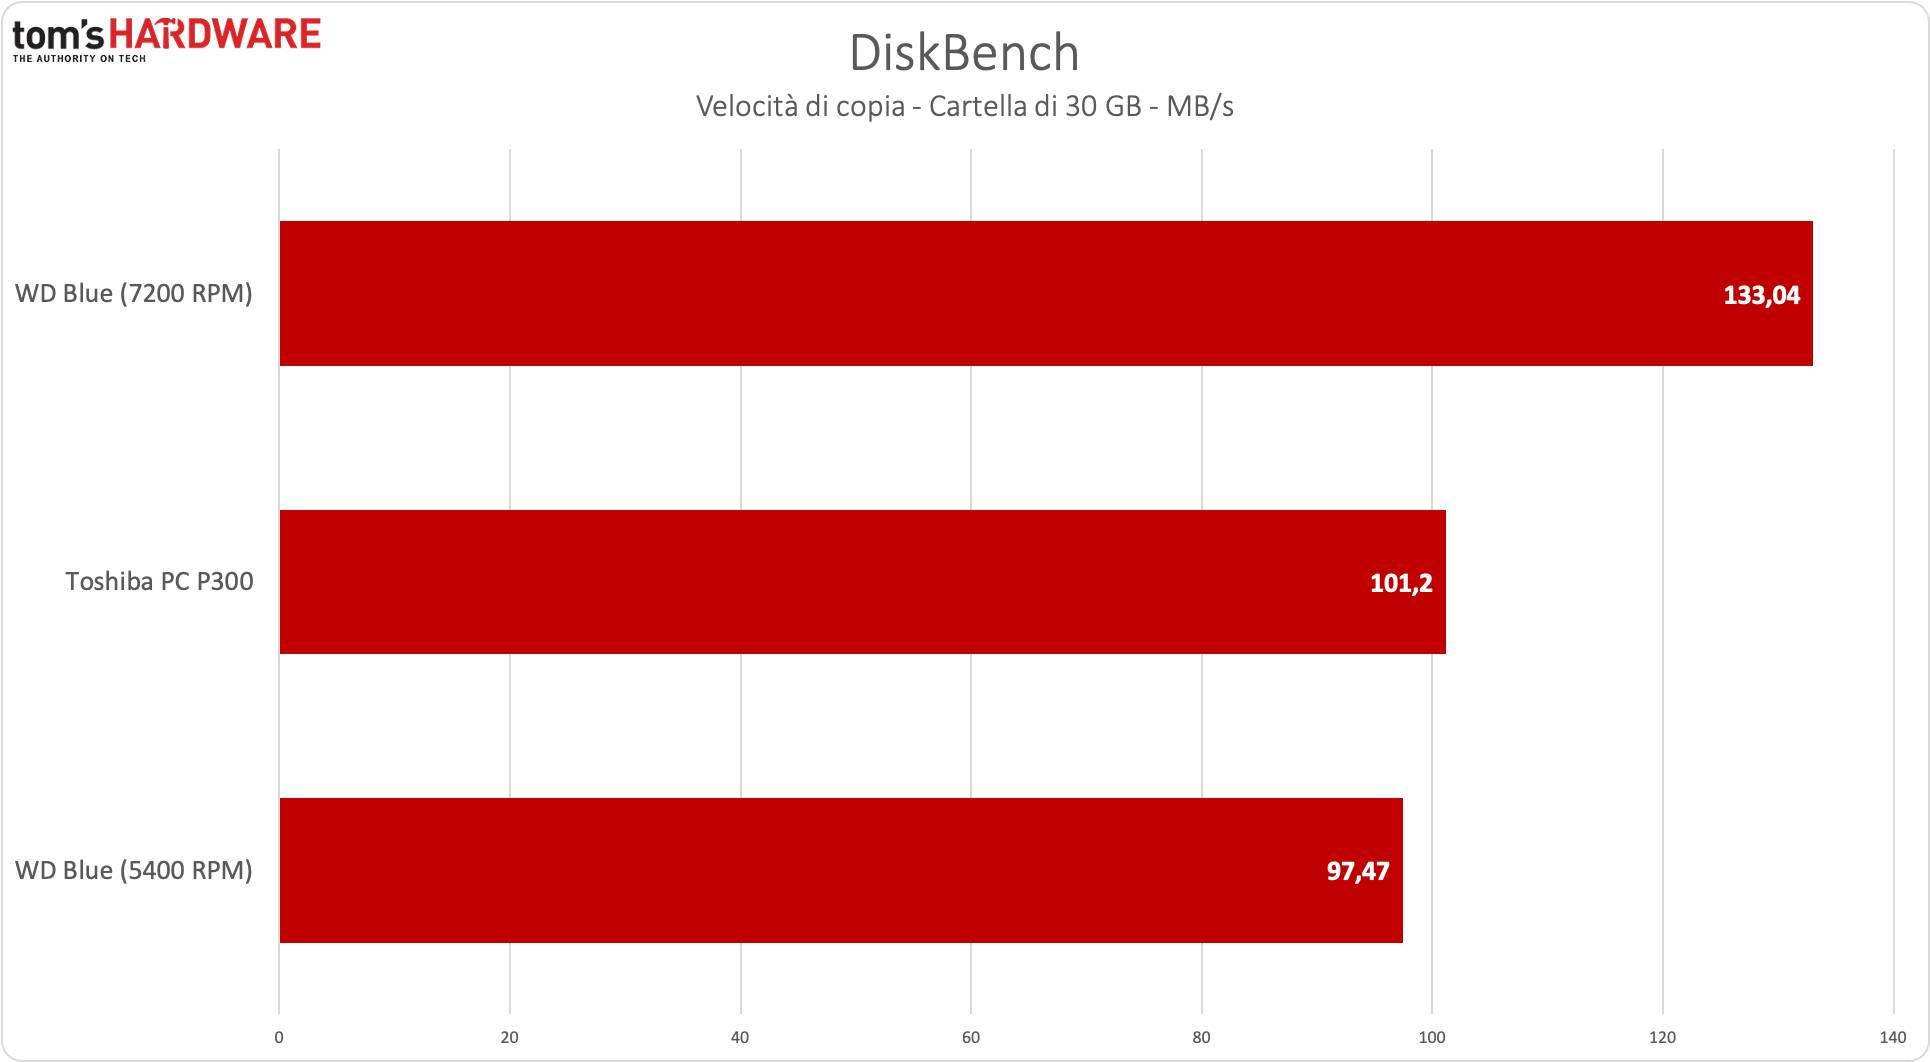 benchmark Toshiba P300 - DiskBench scrittura